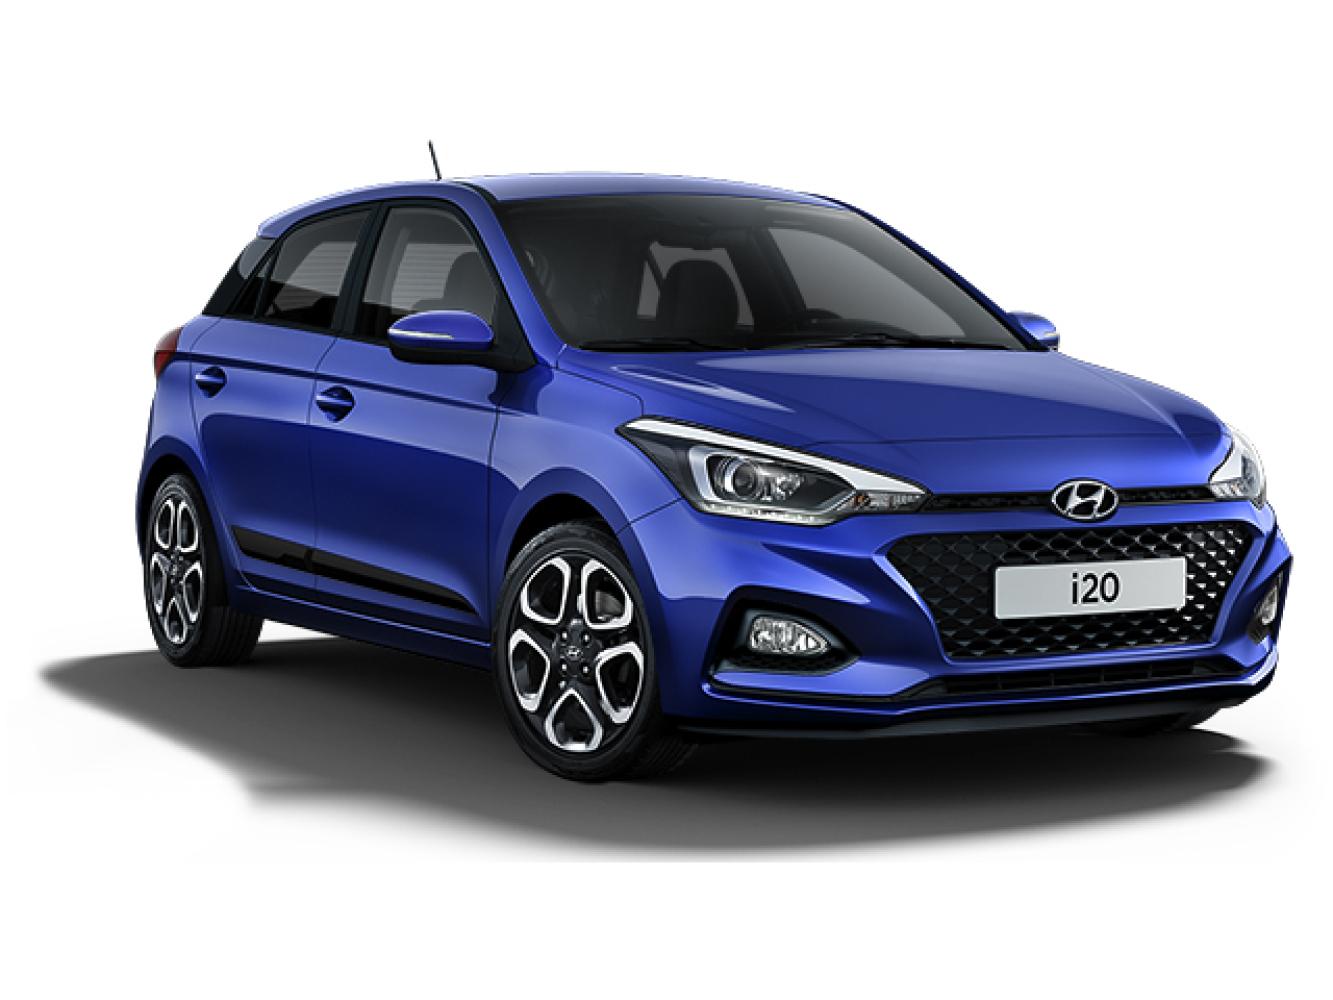 Great Lease Deals >> New Hyundai i20 1.2 Mpi Premium Nav 5Dr Petrol Hatchback for Sale | Bristol Street